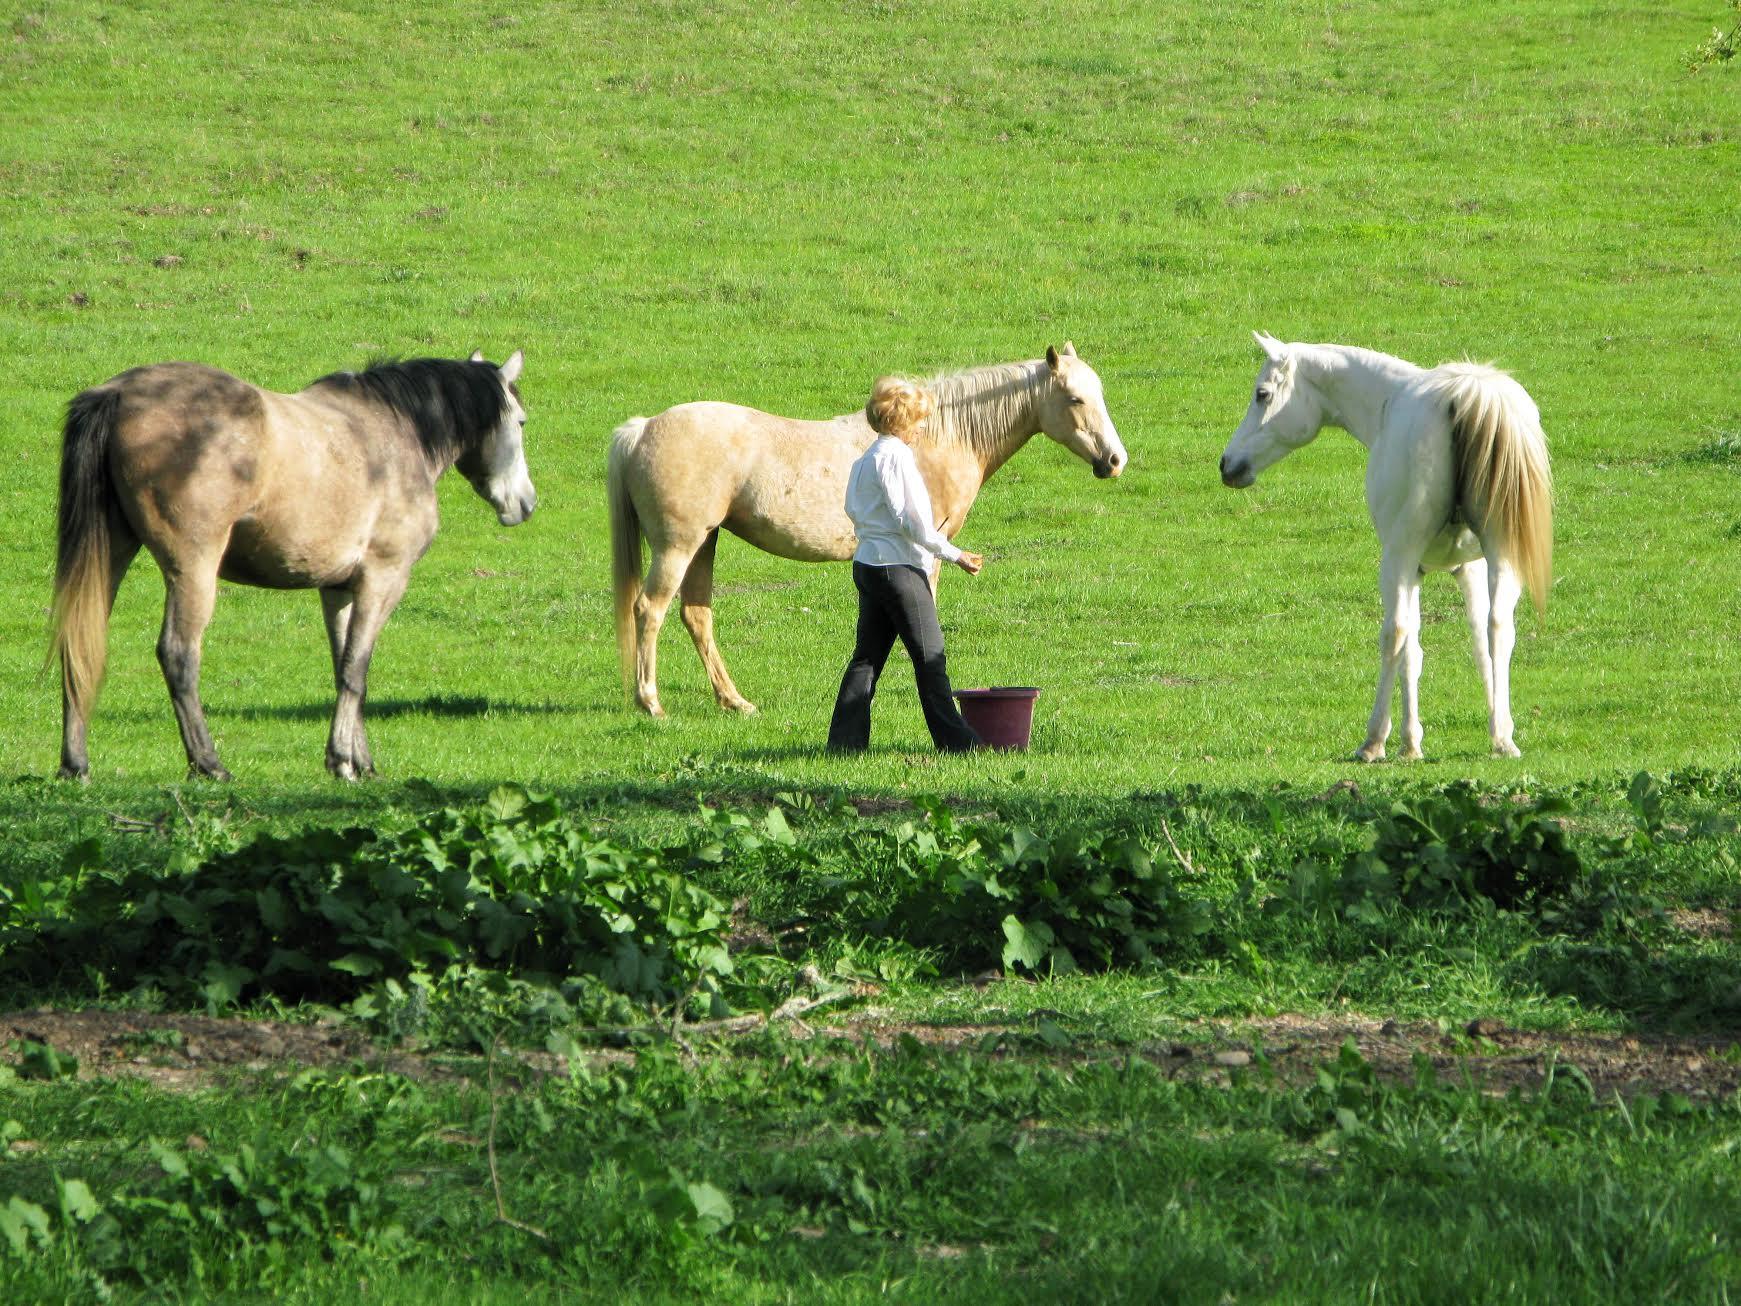 Carolyn training several horses while Sharing Territory